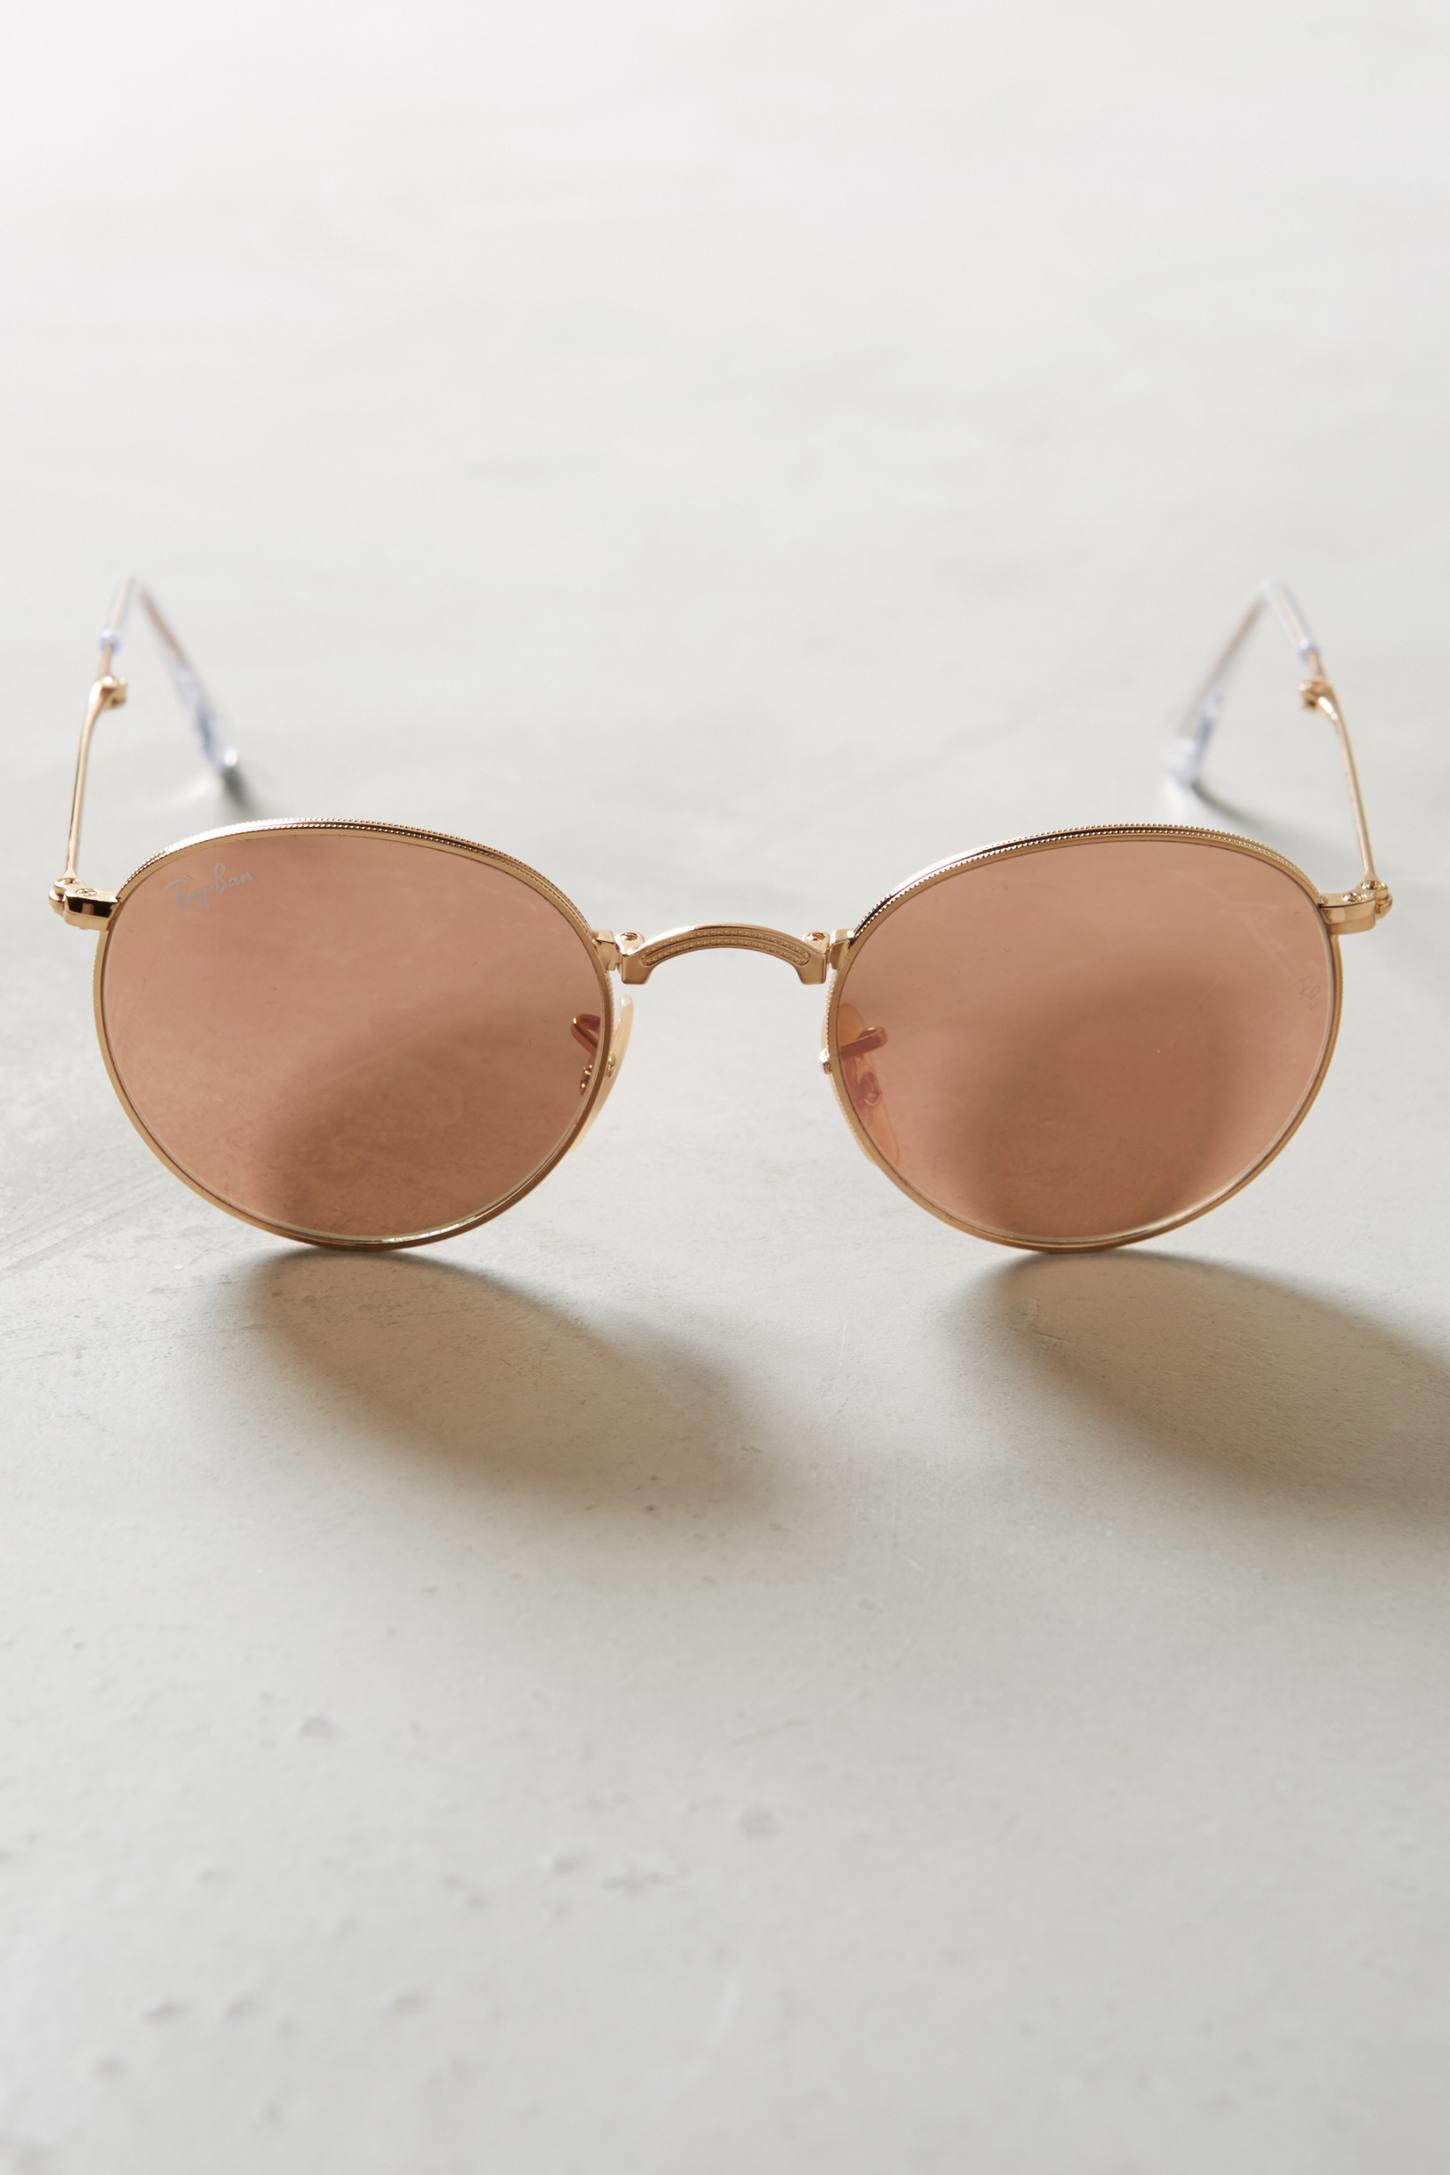 e1ab9710182 Sunglasses Ray Ban Folding Sunglass Hut « Heritage Malta